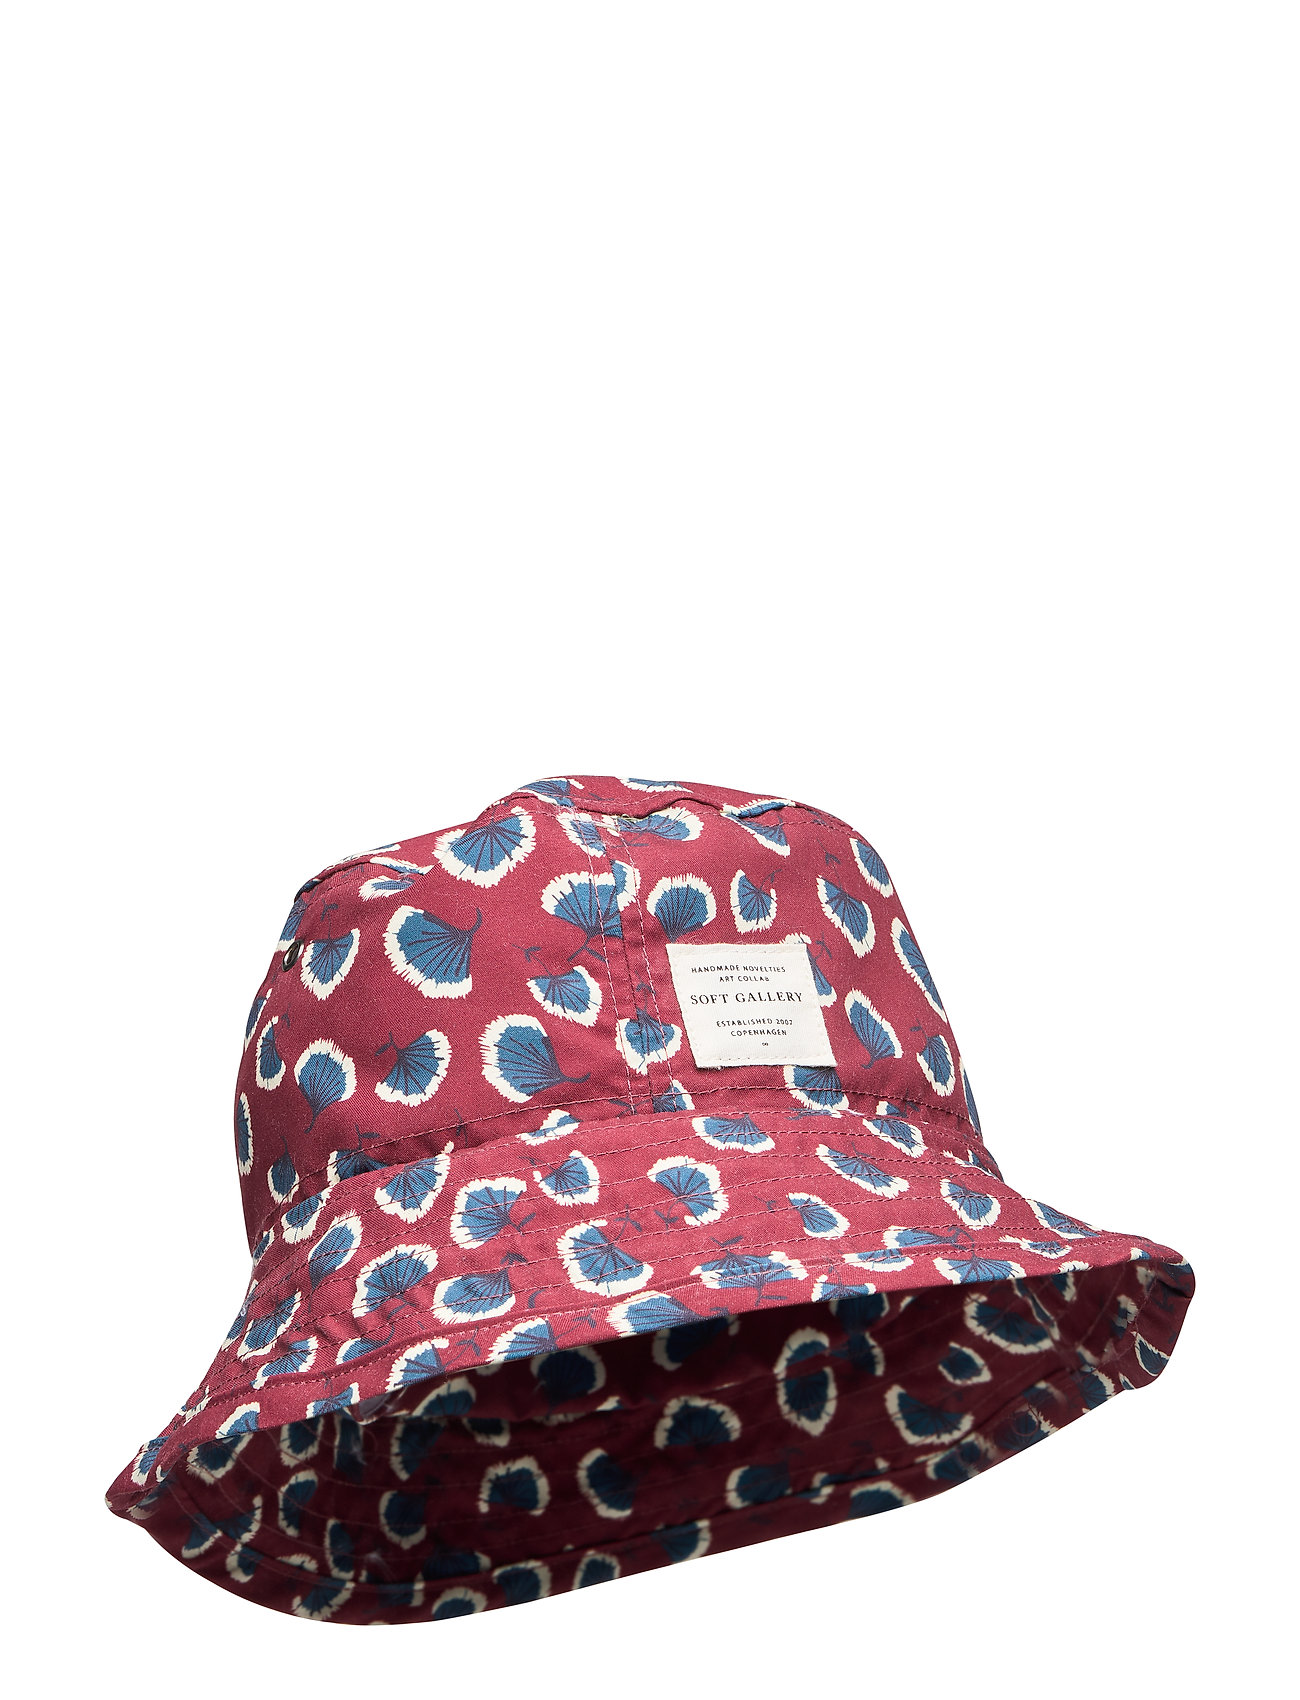 Soft Gallery Camden Hat - RUSSET BROWN, AOP CORAL